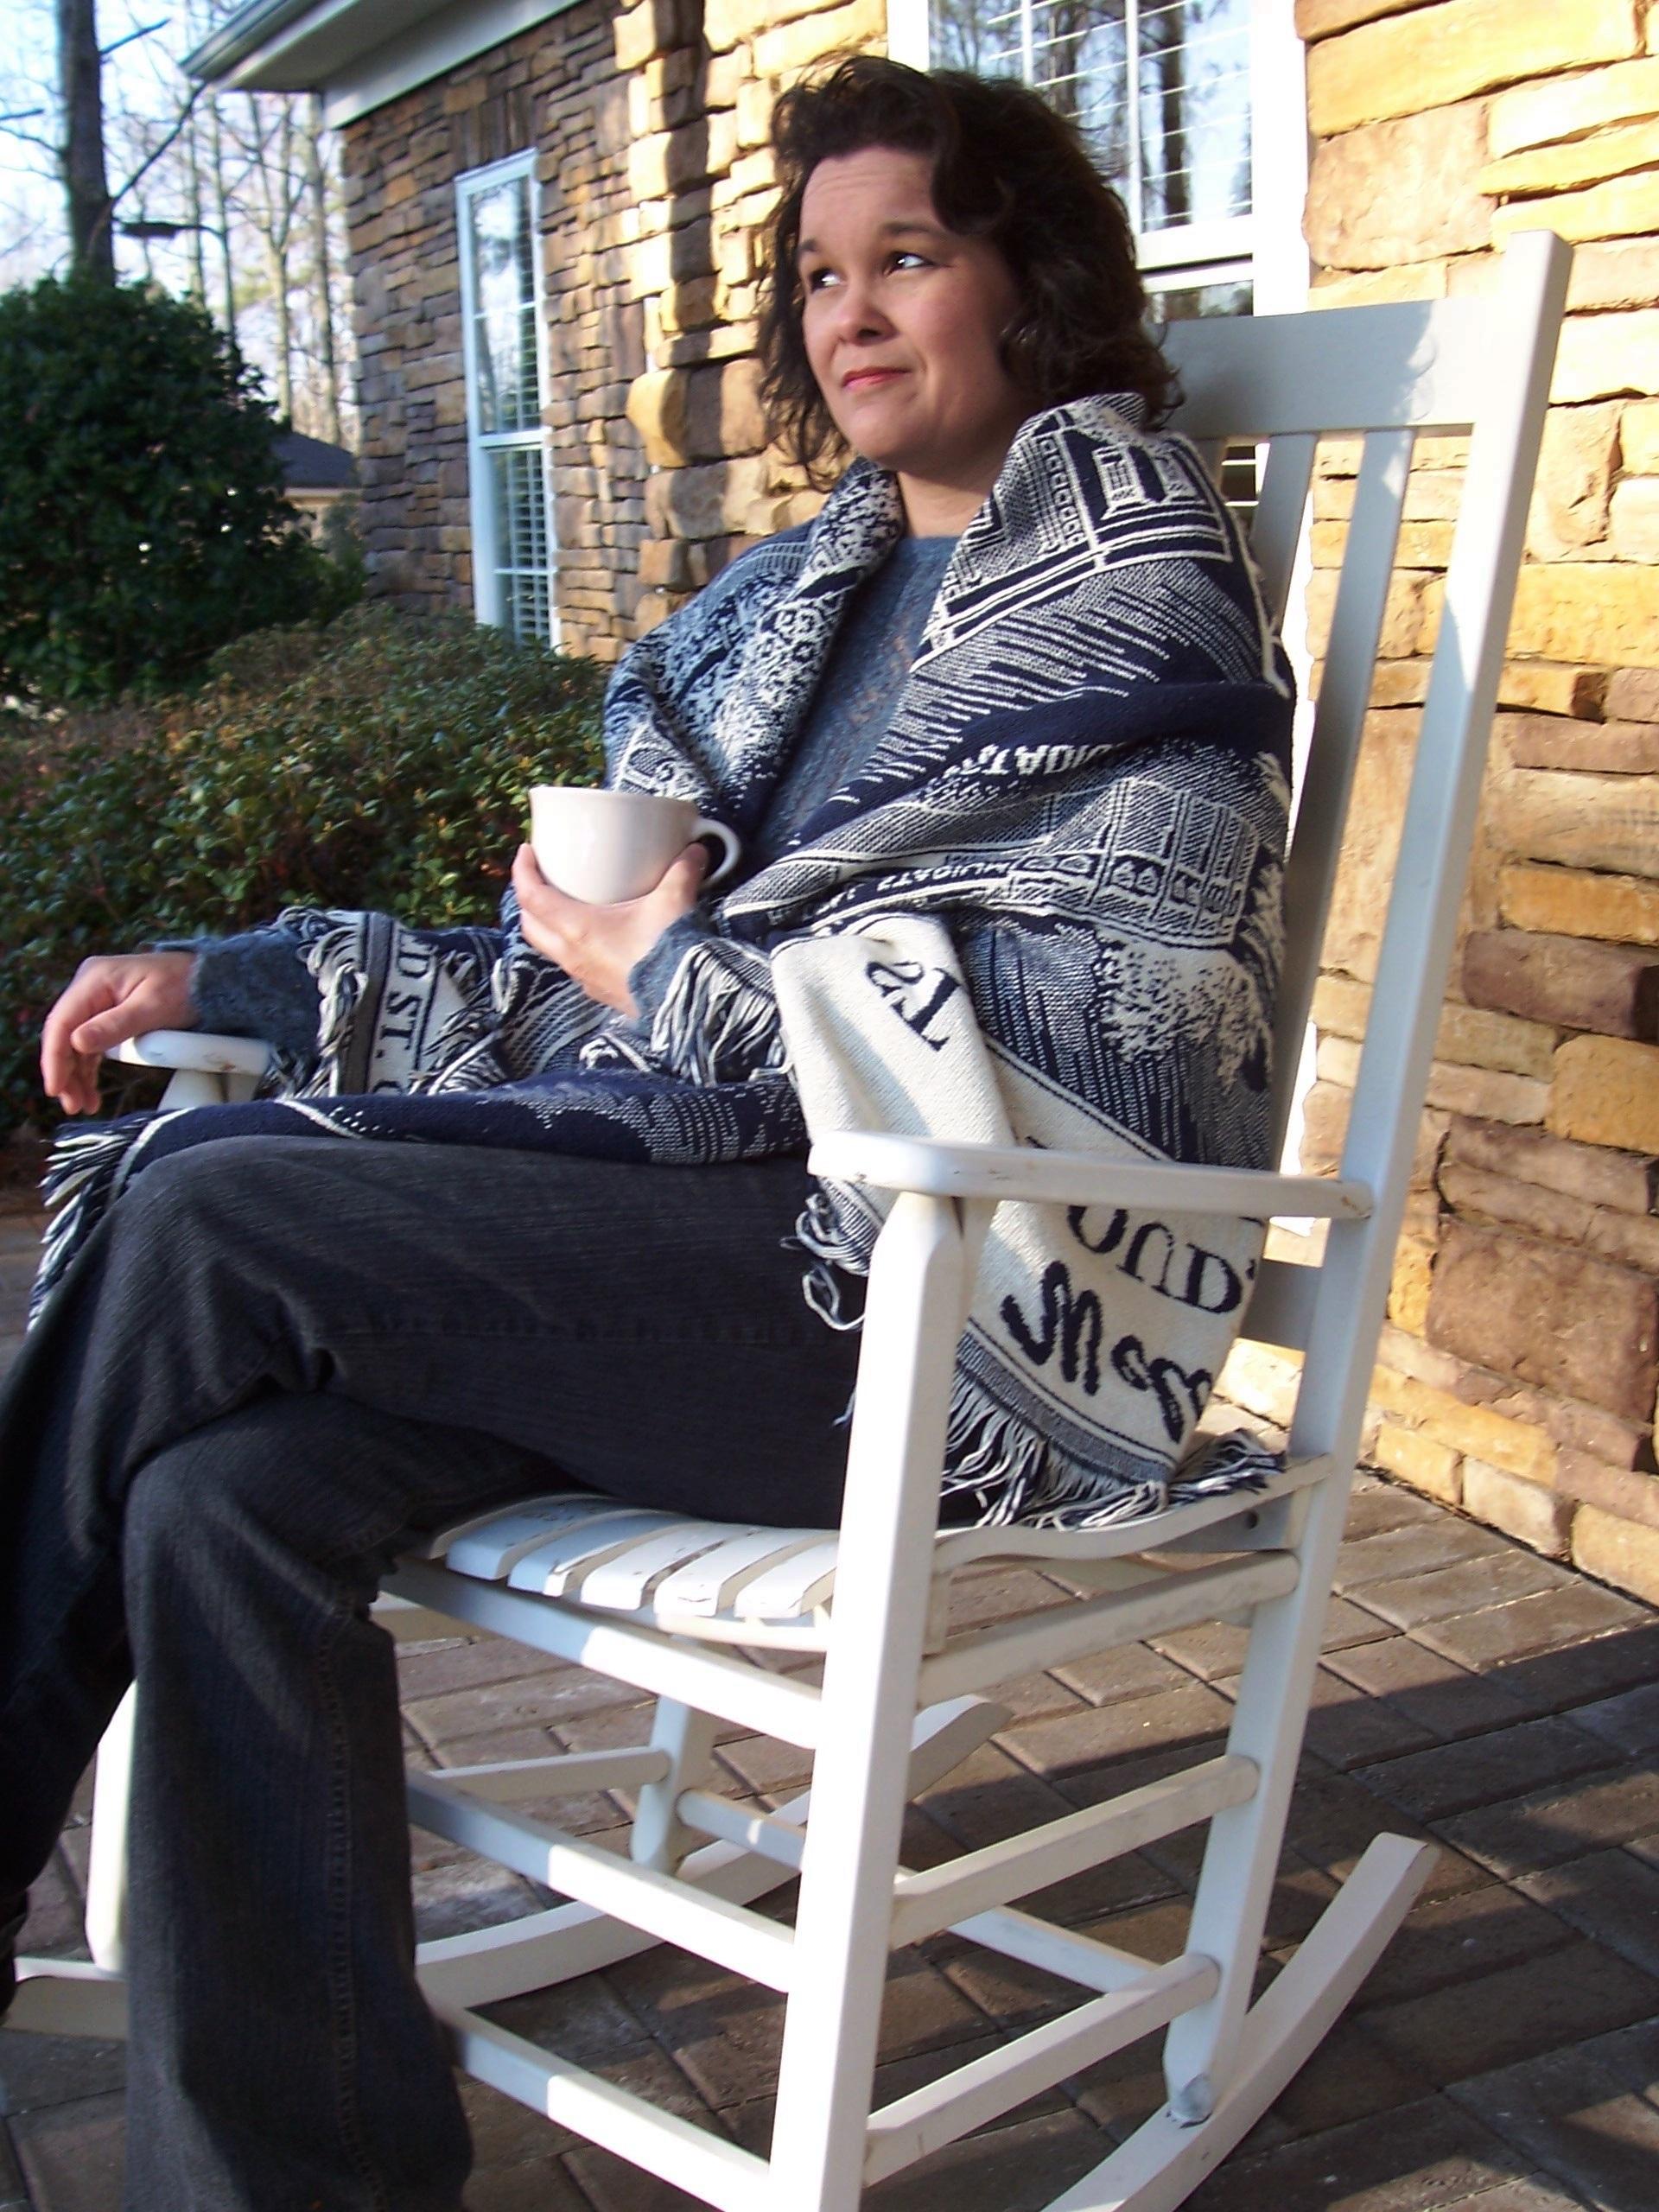 Kaffee Frau Sessel Zuhause Land Veranda Bein Sitzung Mode Kleidung Möbel  Lebensstil Oberbekleidung Draußen Gebürtig Kleid